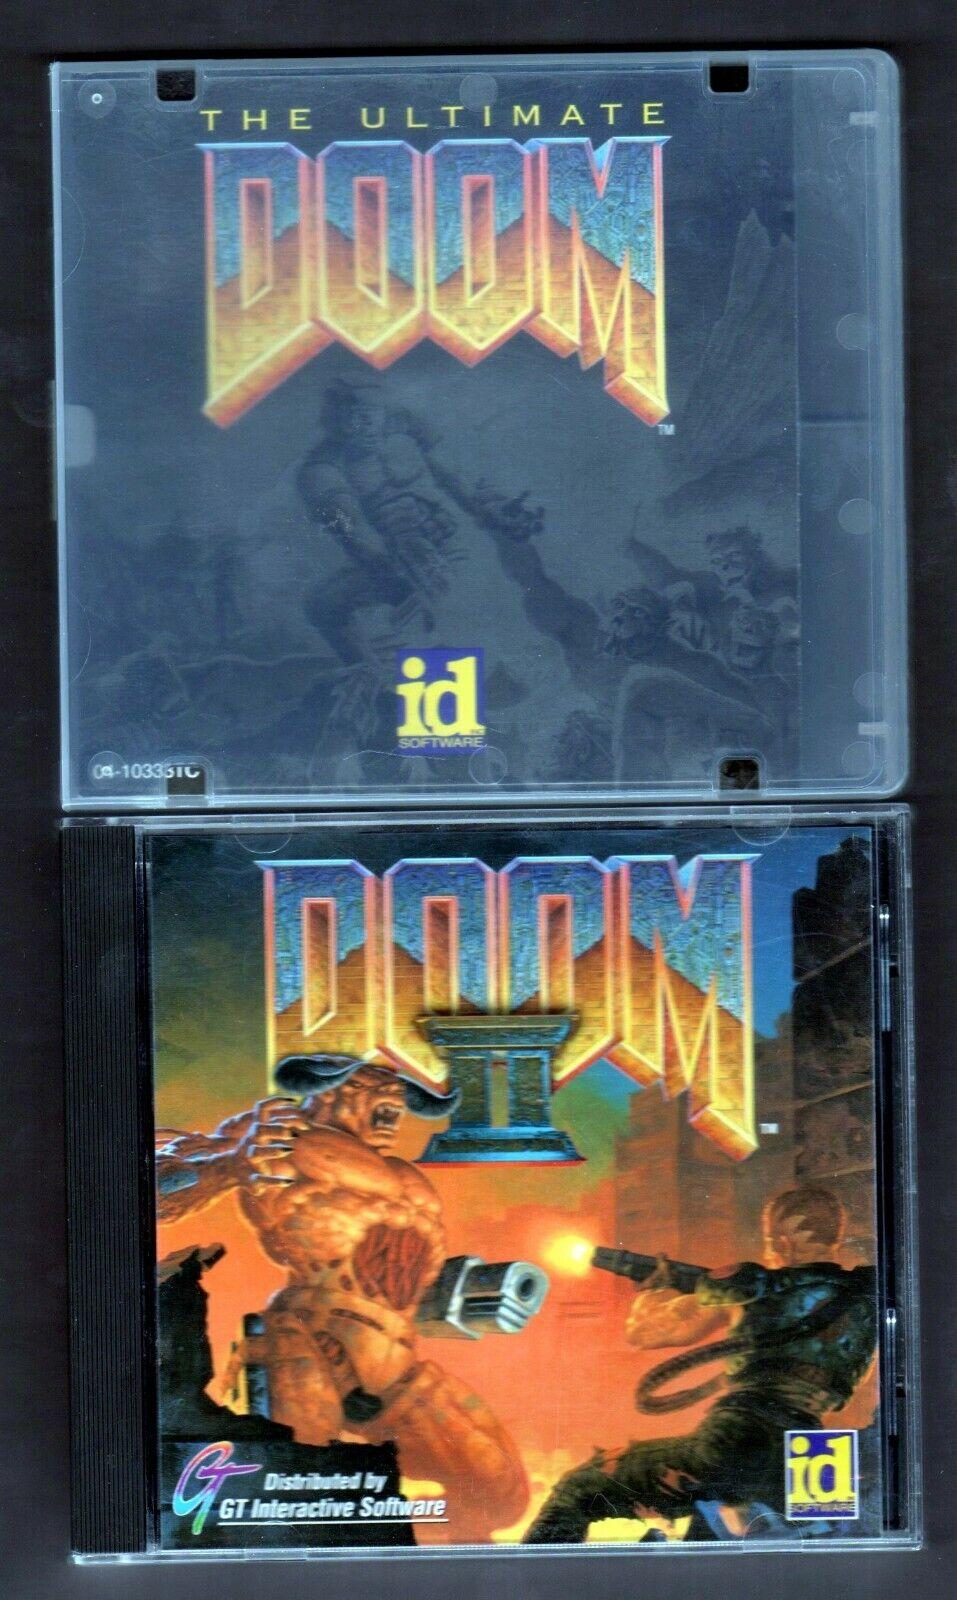 Computer Games - Doom & Doom II - PC Game Retro Computer Video Game CD-Rom - LOT of 2 Games